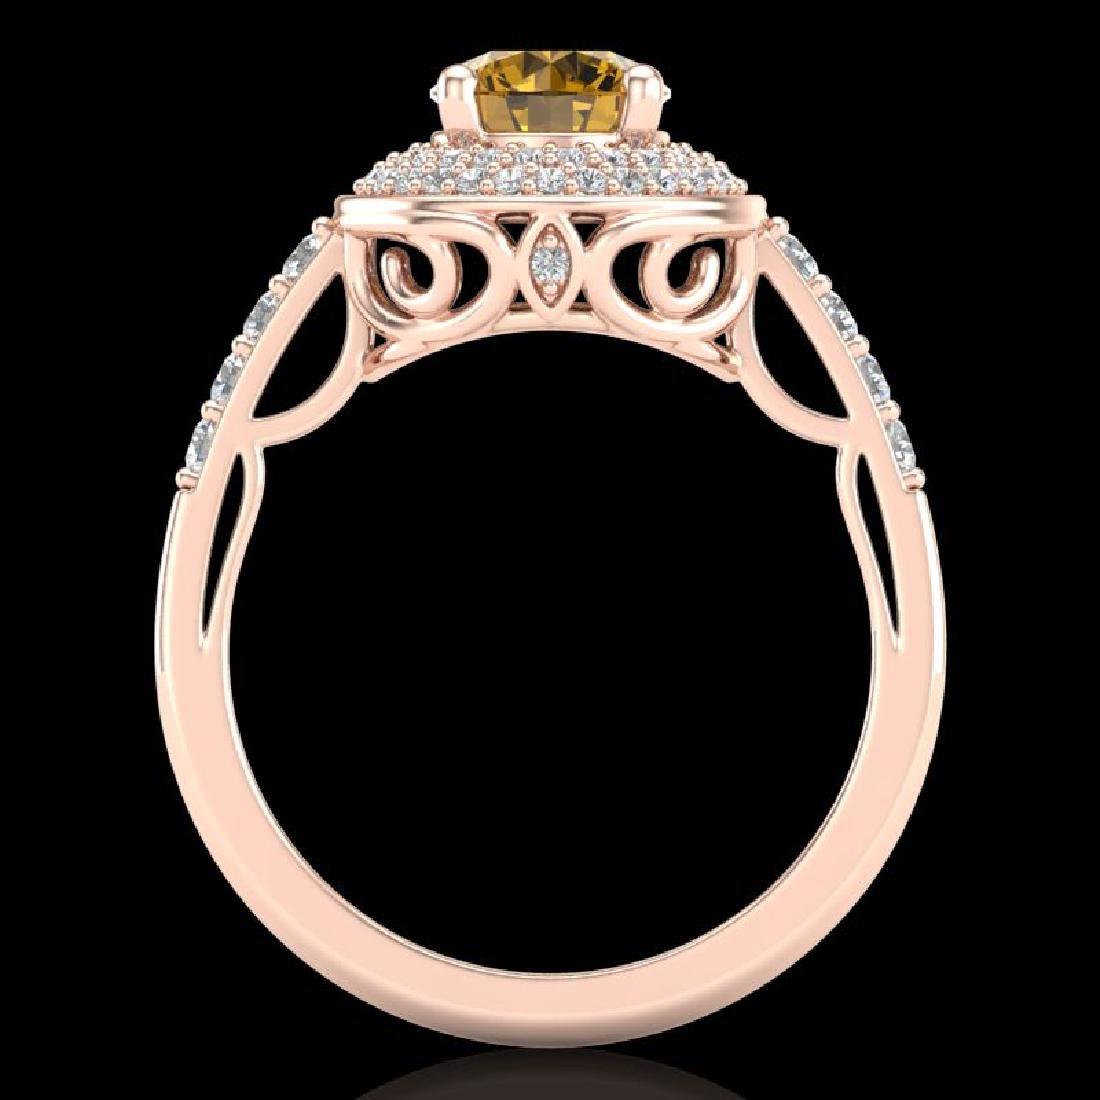 1.7 CTW Intense Fancy Yellow Diamond Engagement Art - 3